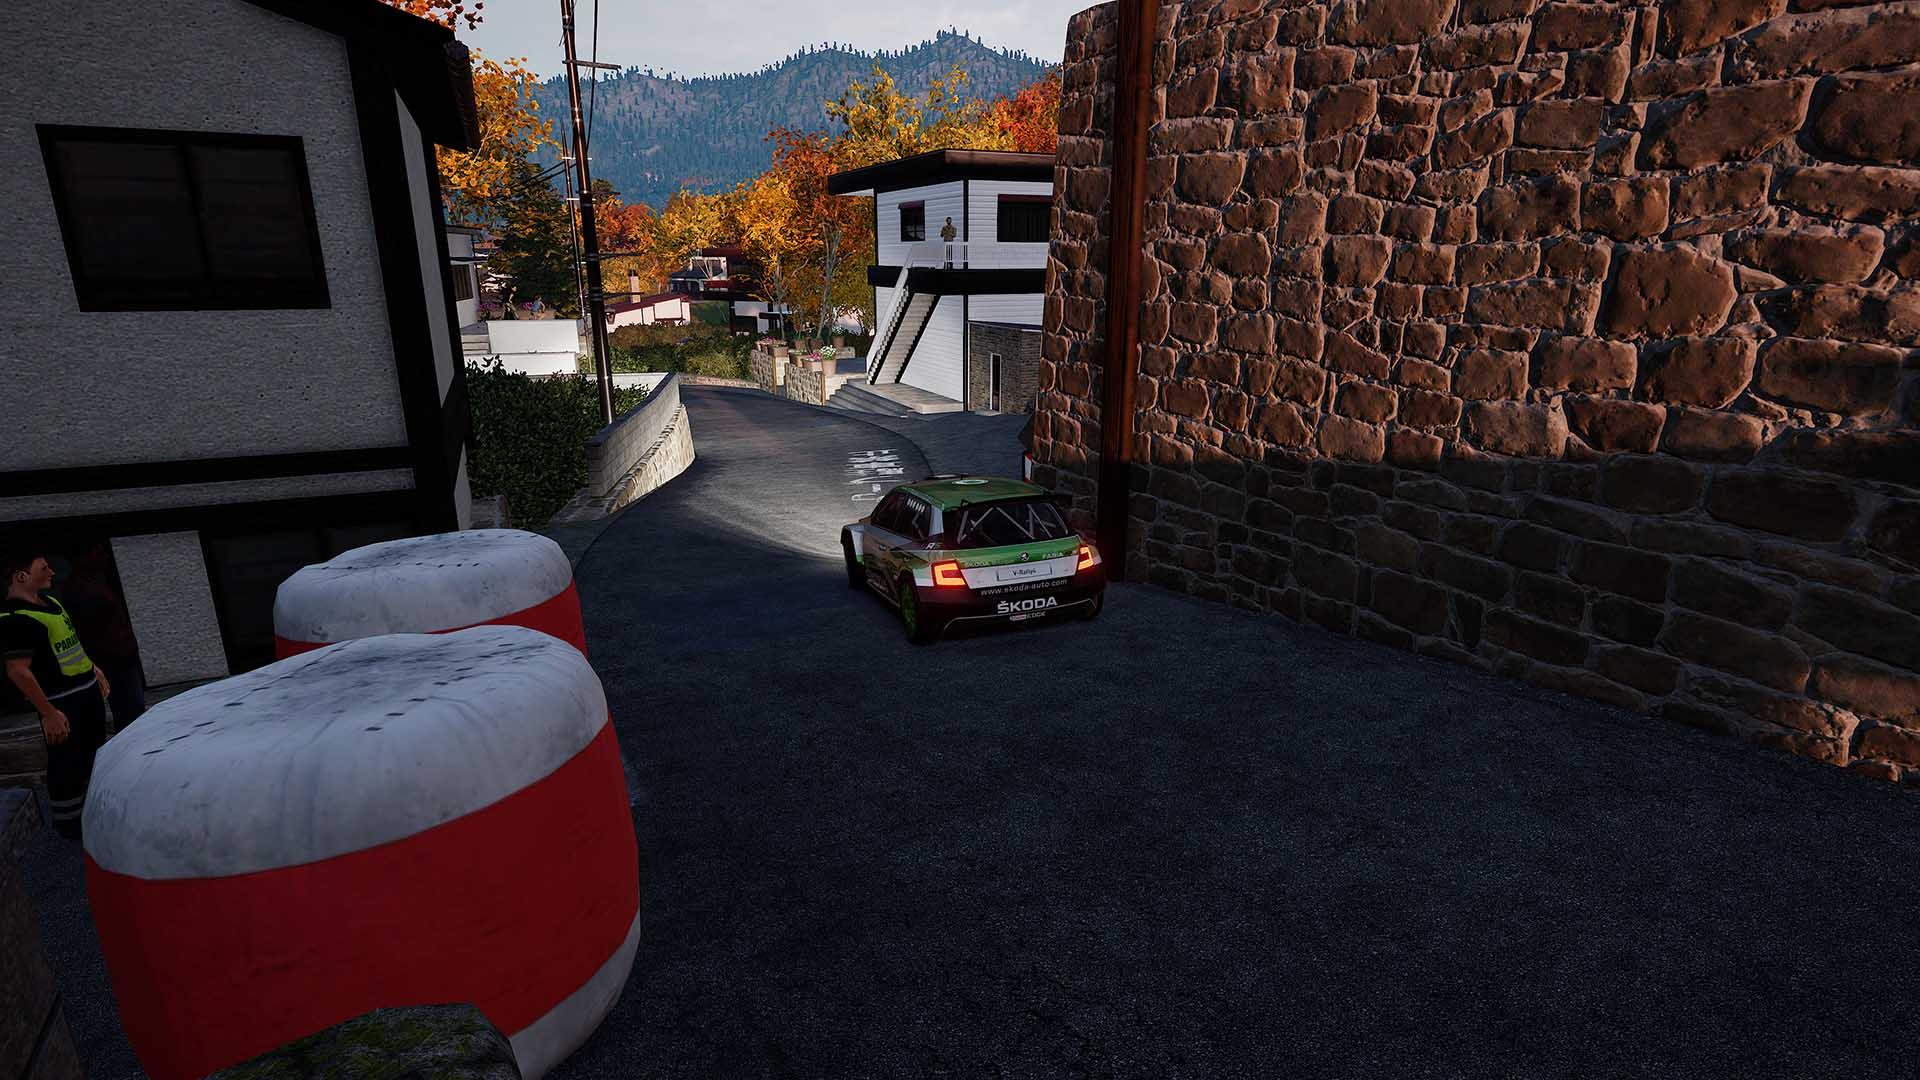 Análisis de V-Rally 4 - Xbox One 6